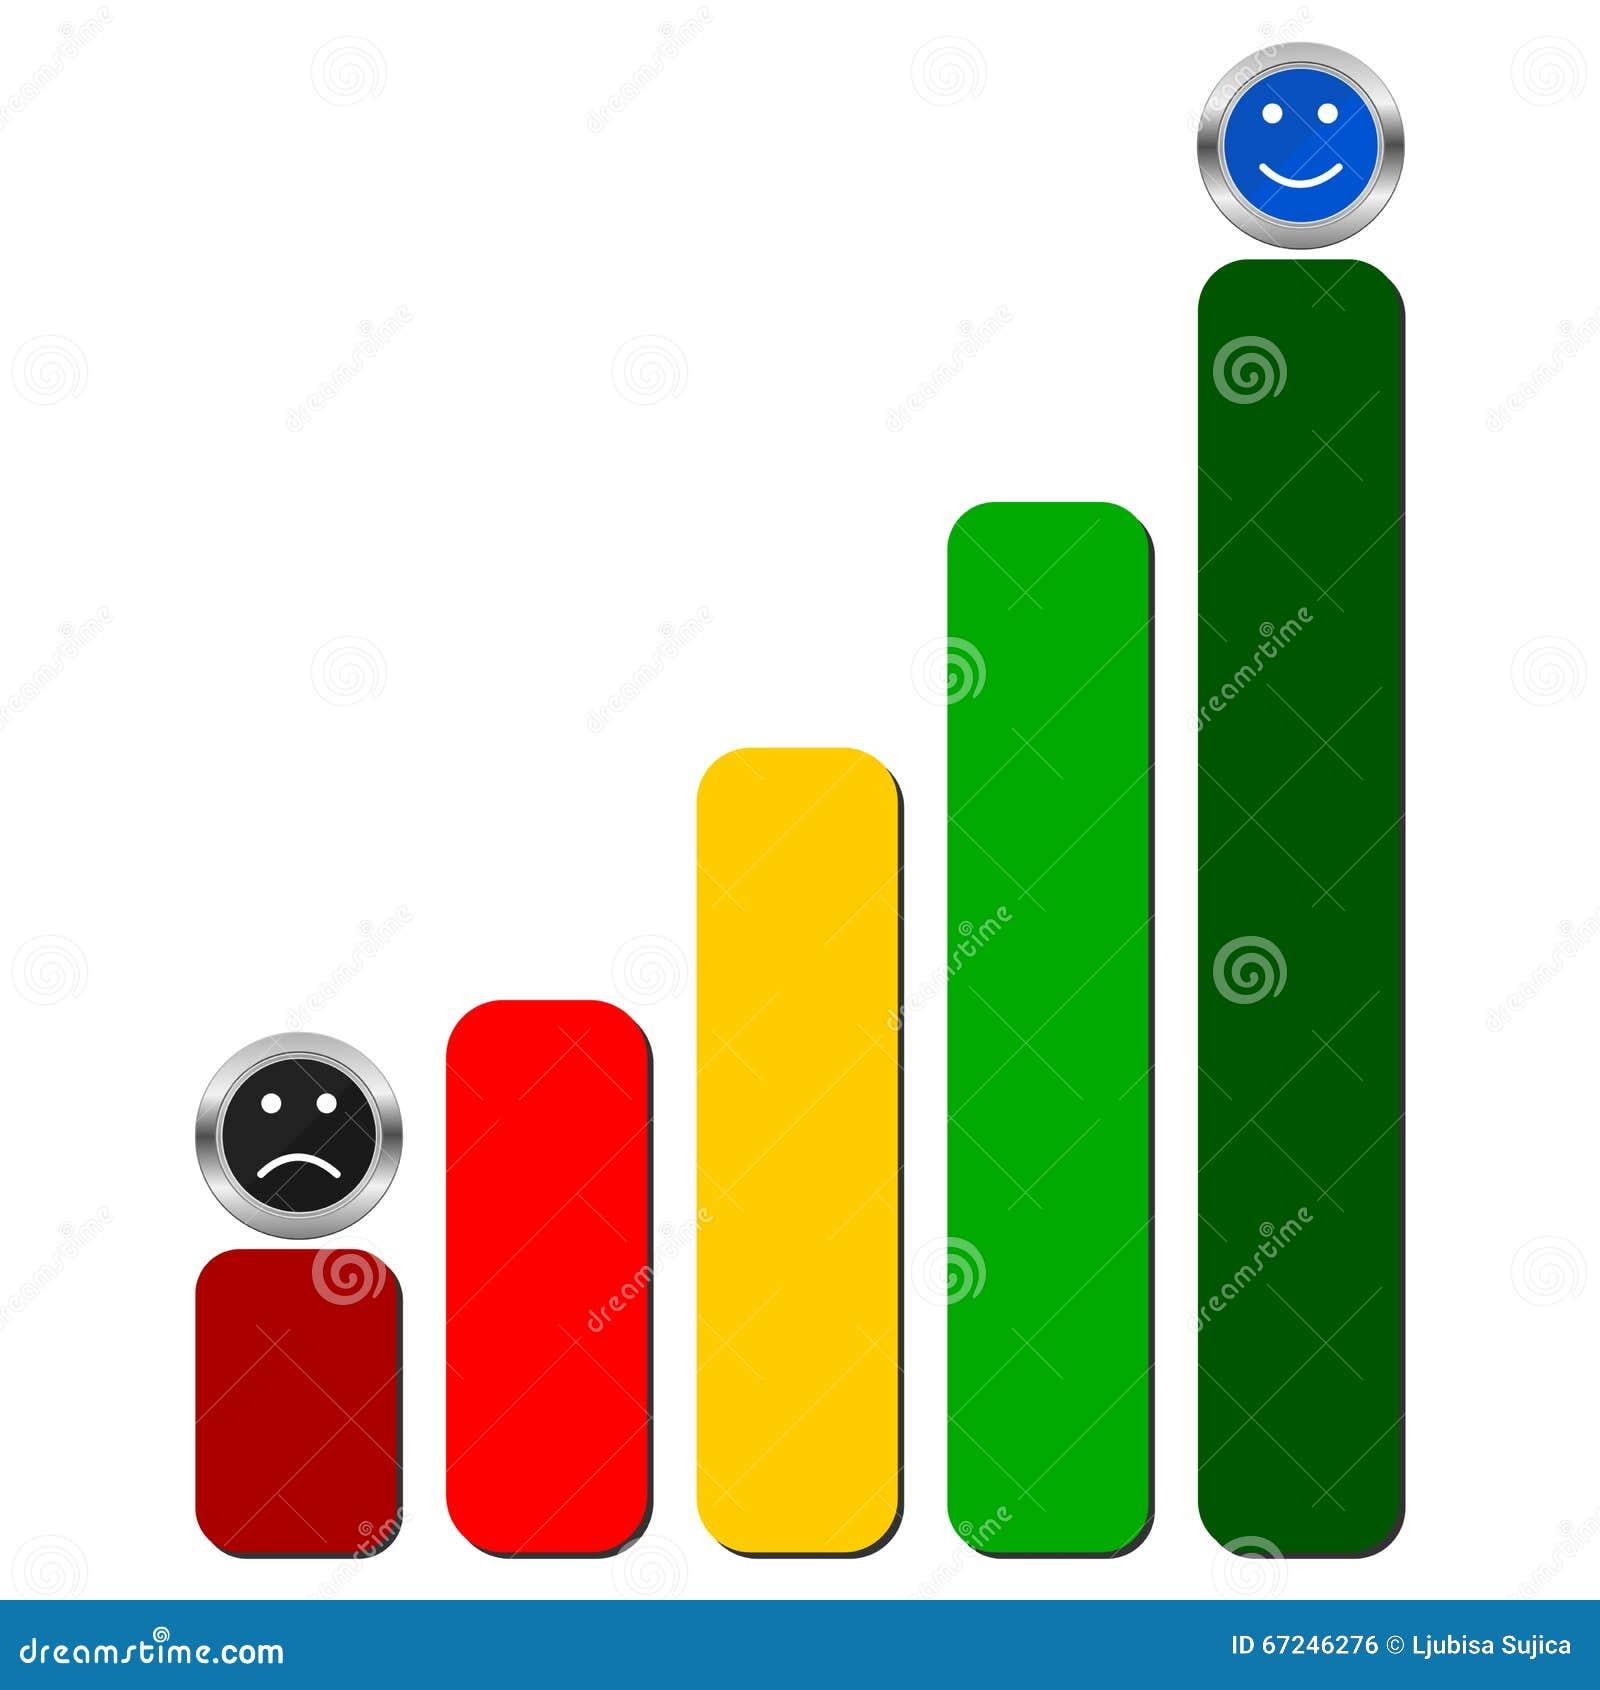 Progress icon with smiles